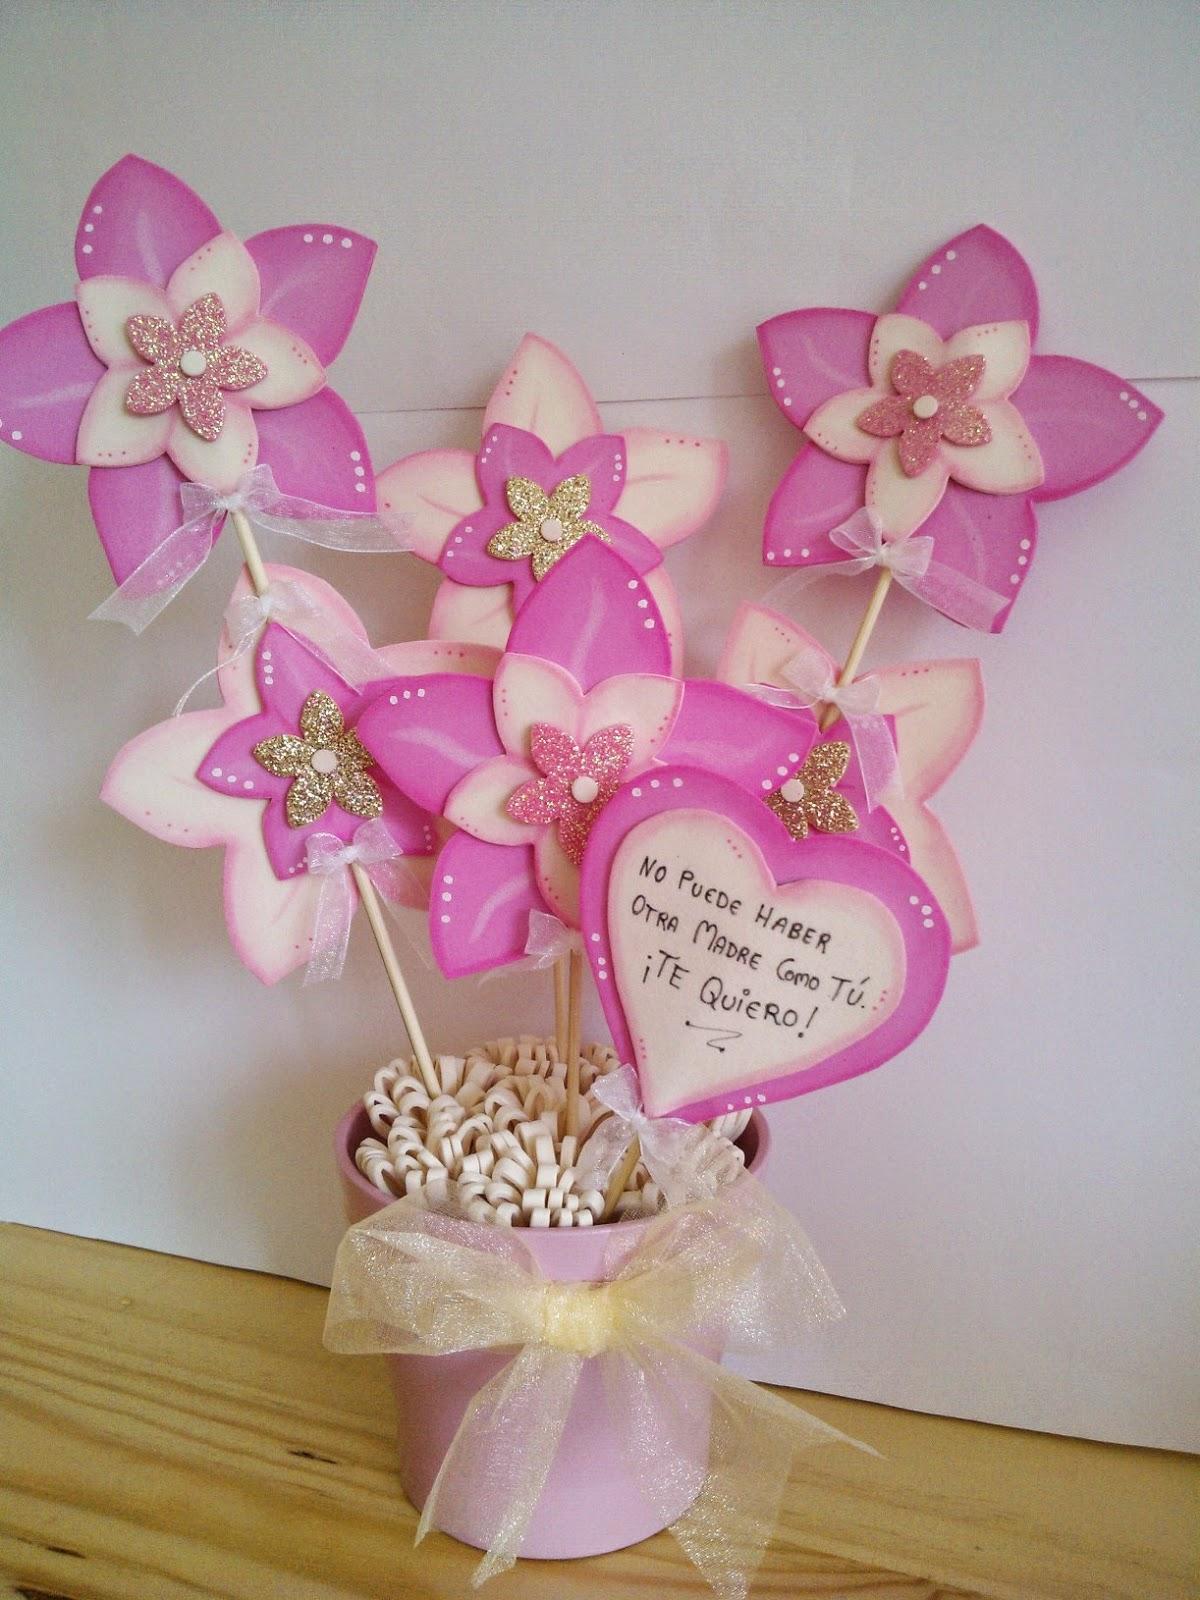 Cucadas de mami maceta decorada flores de goma eva para for Detalles de manualidades